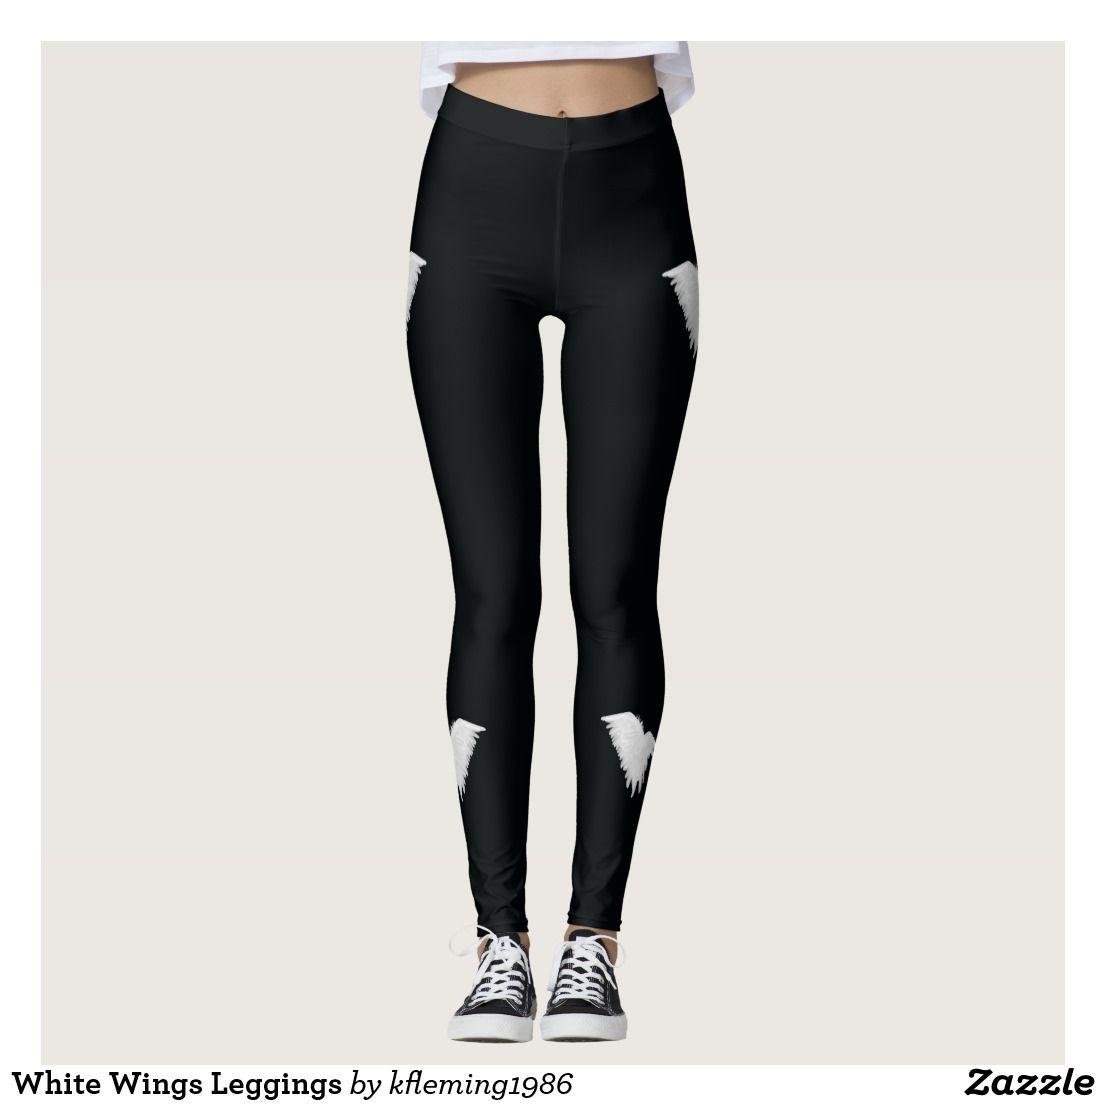 White Wings Leggings